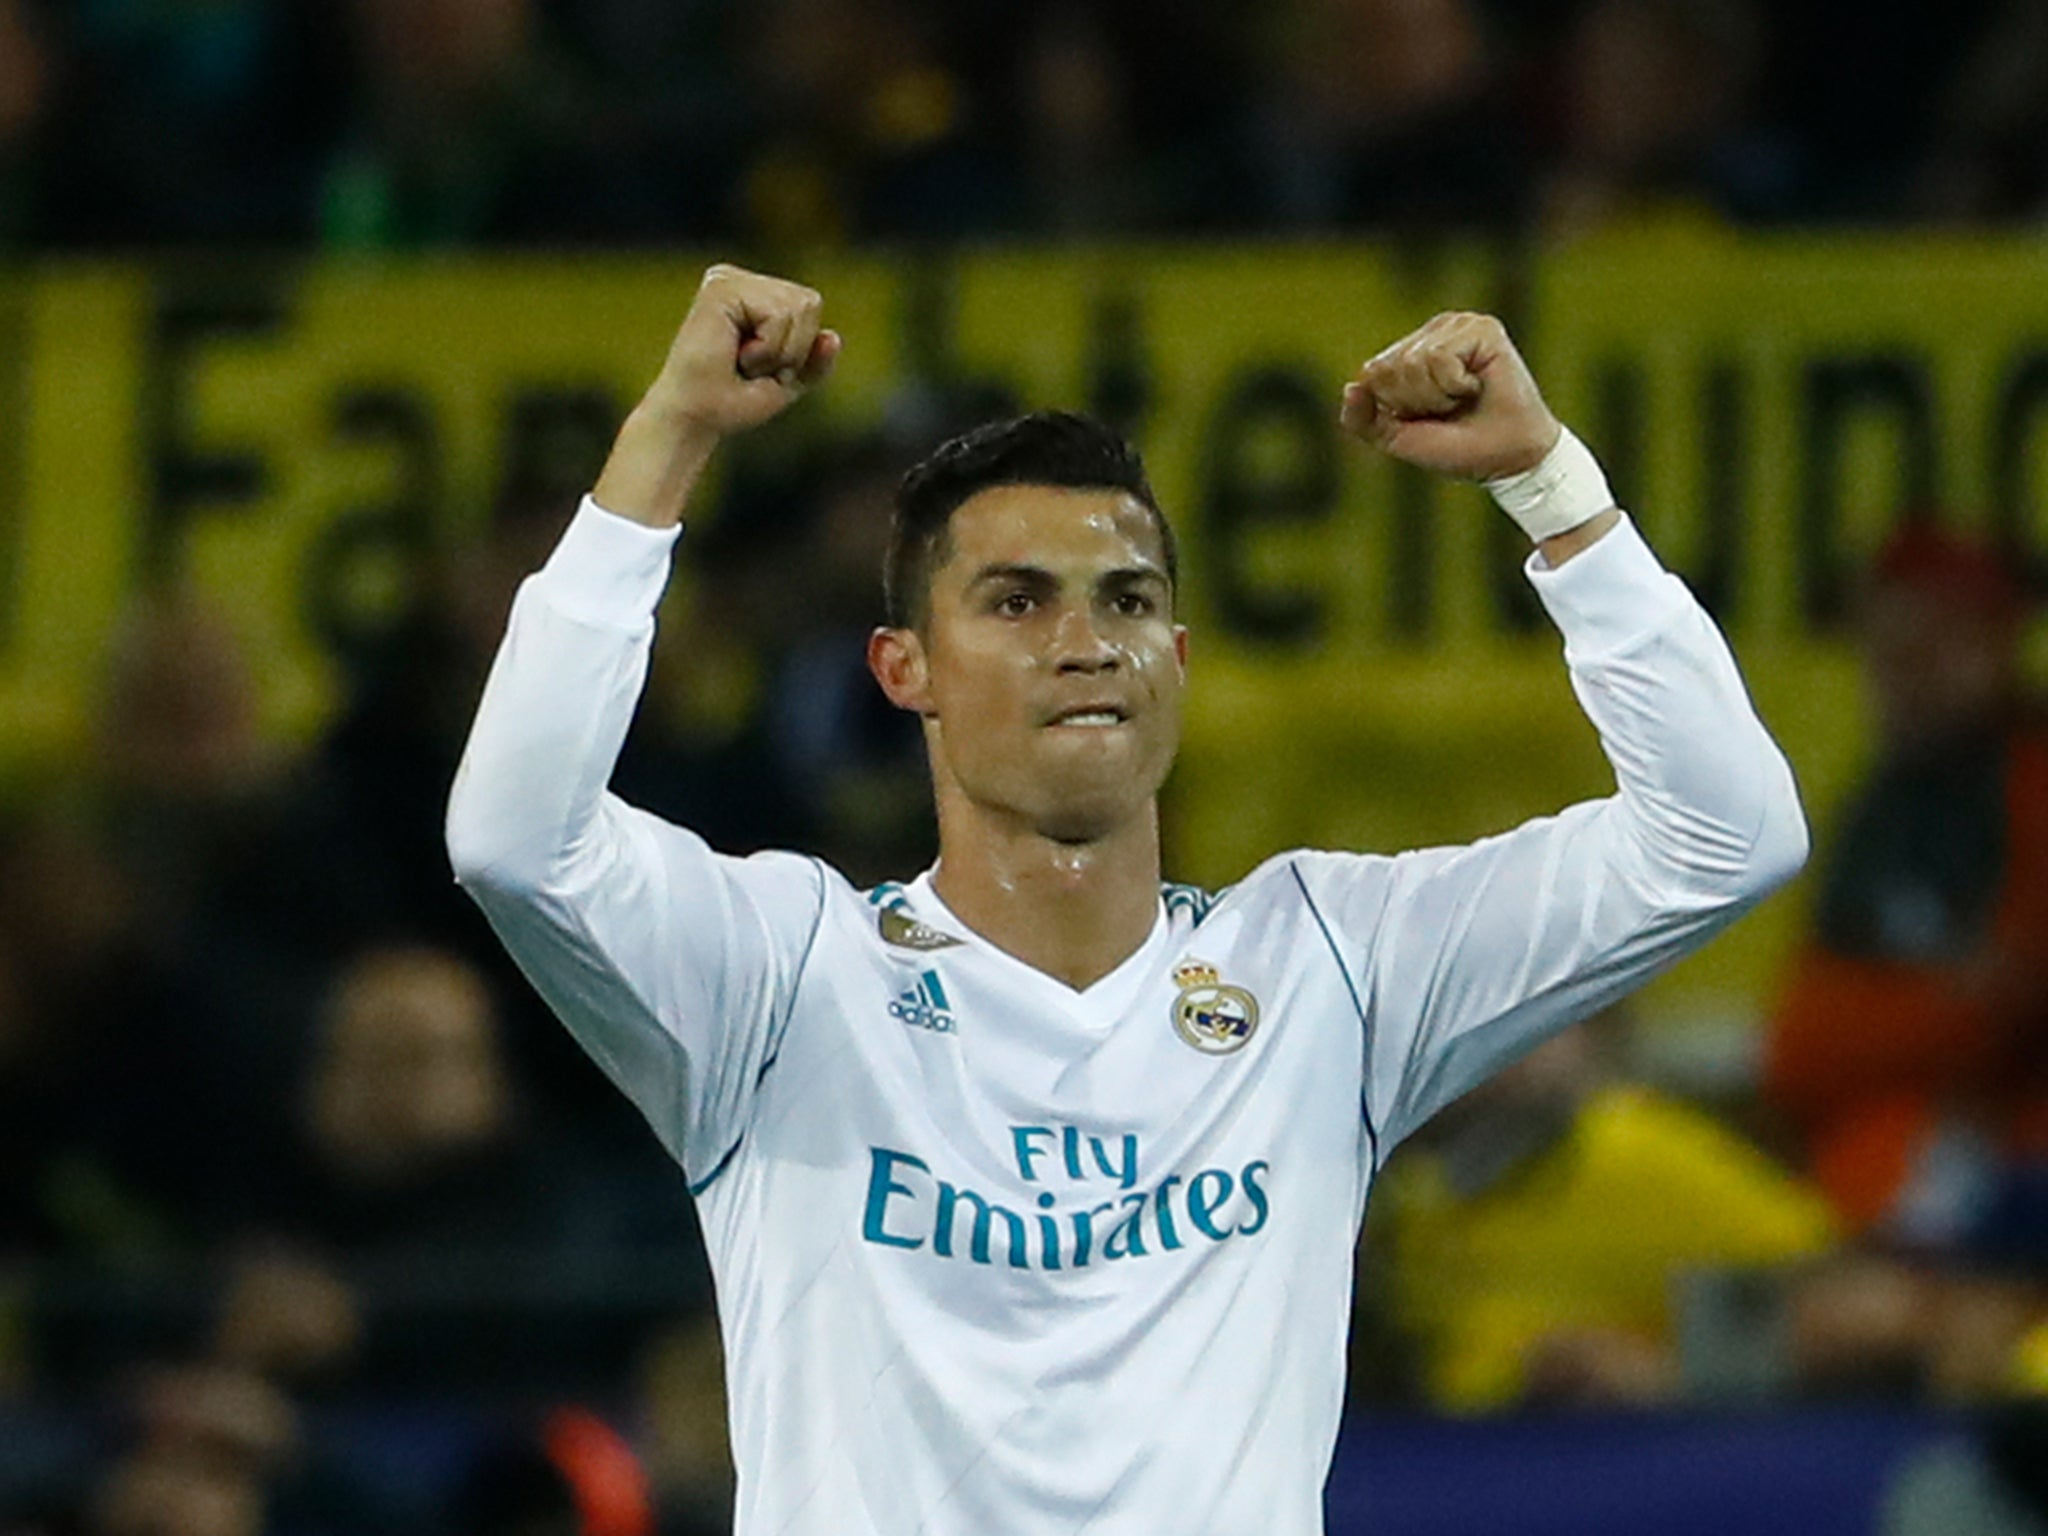 Cristiano Ronaldo raises £600 000 for Make A Wish Foundation by